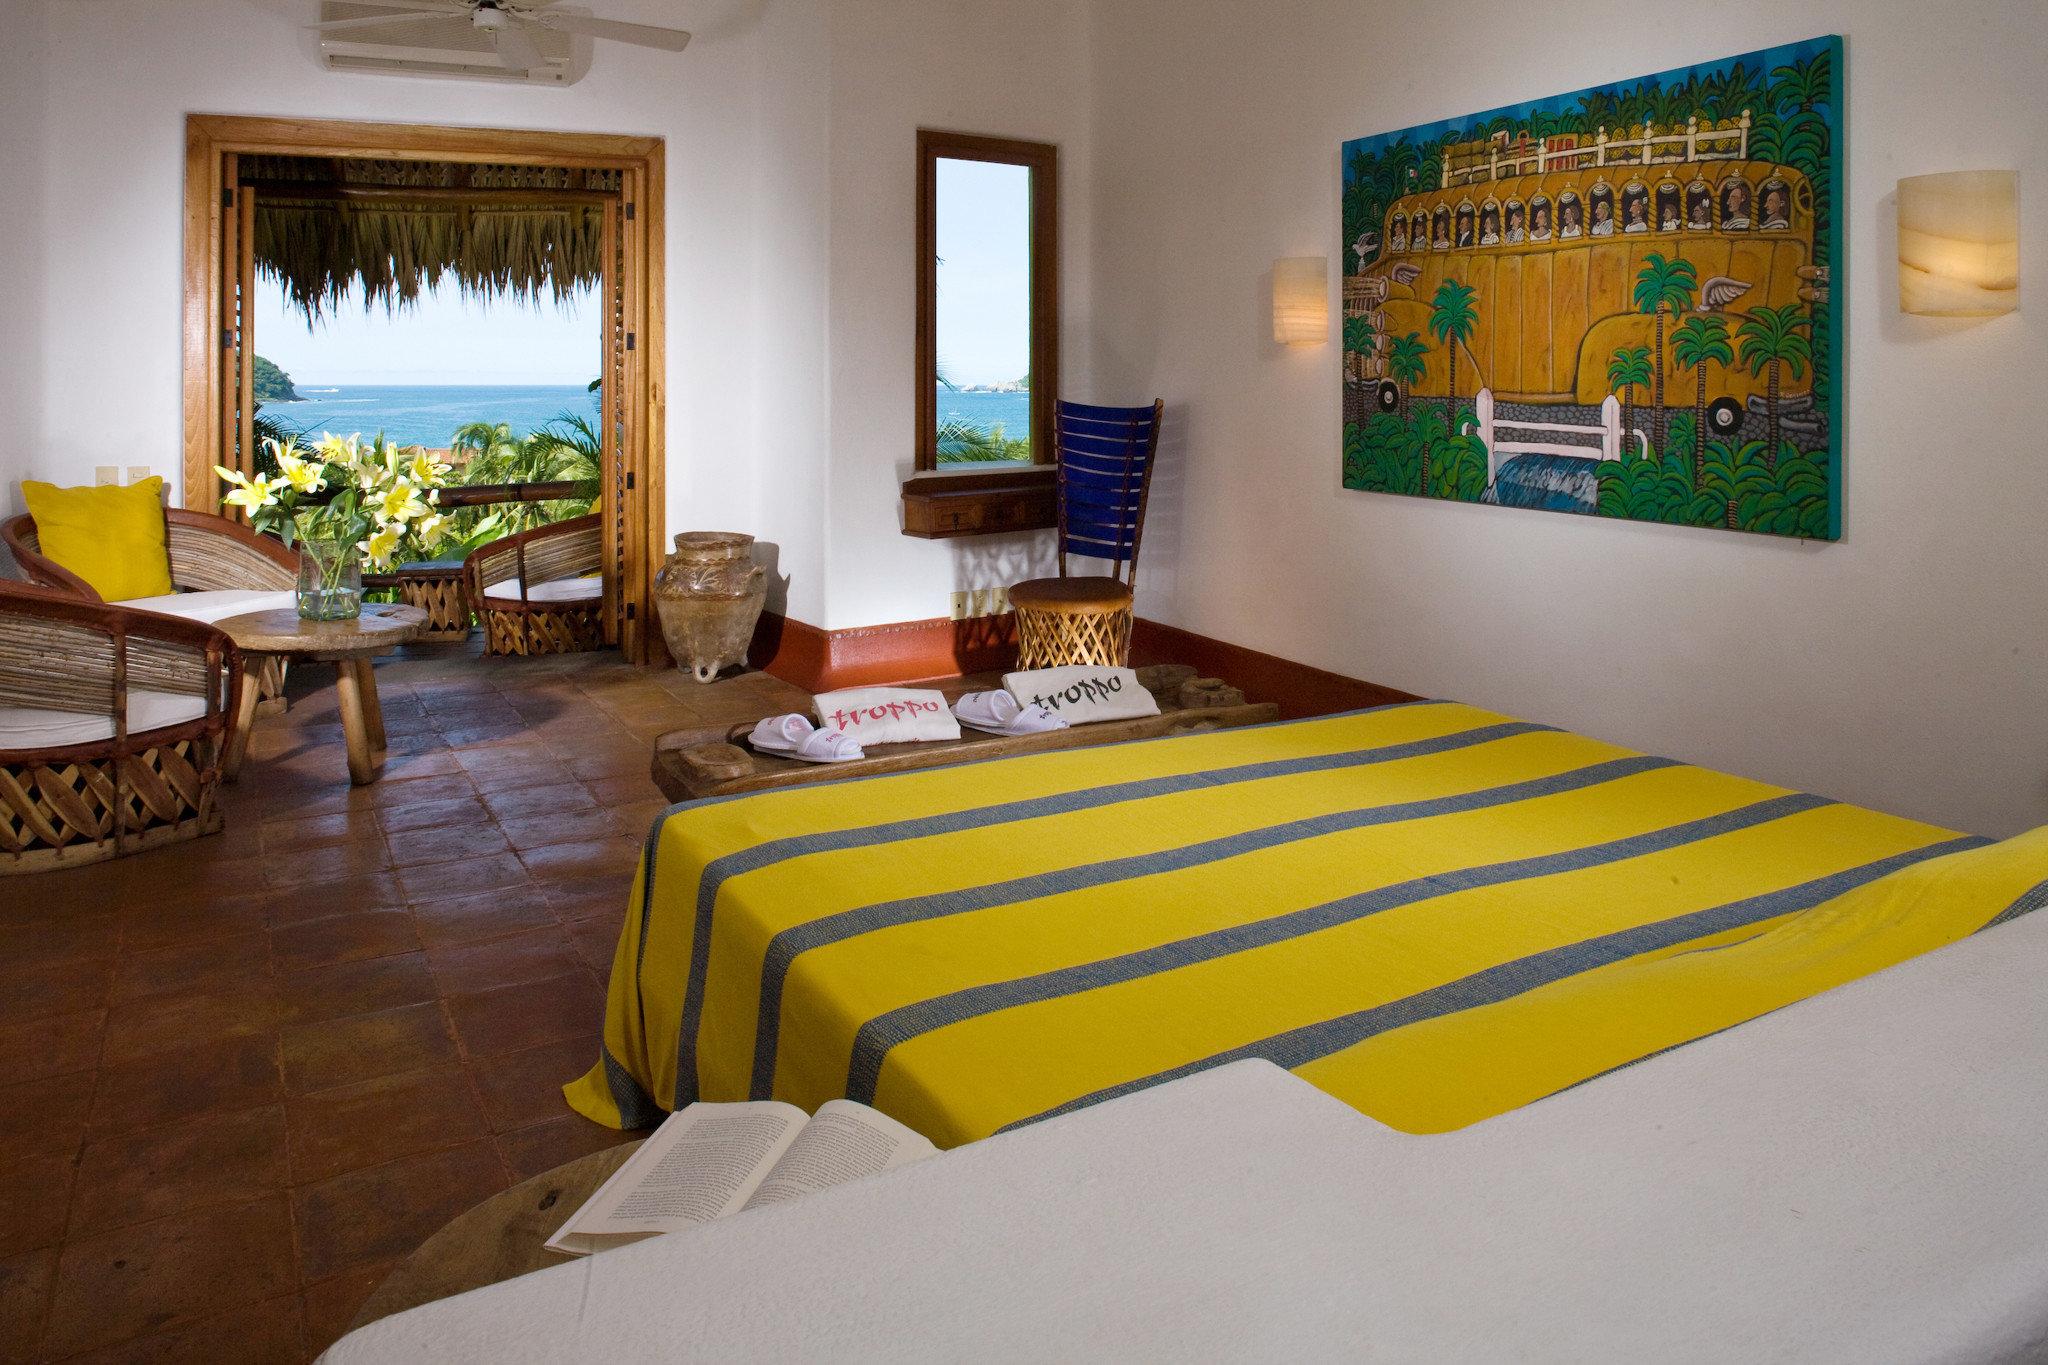 Bedroom Rustic Scenic views property yellow Resort Villa home Suite cottage condominium